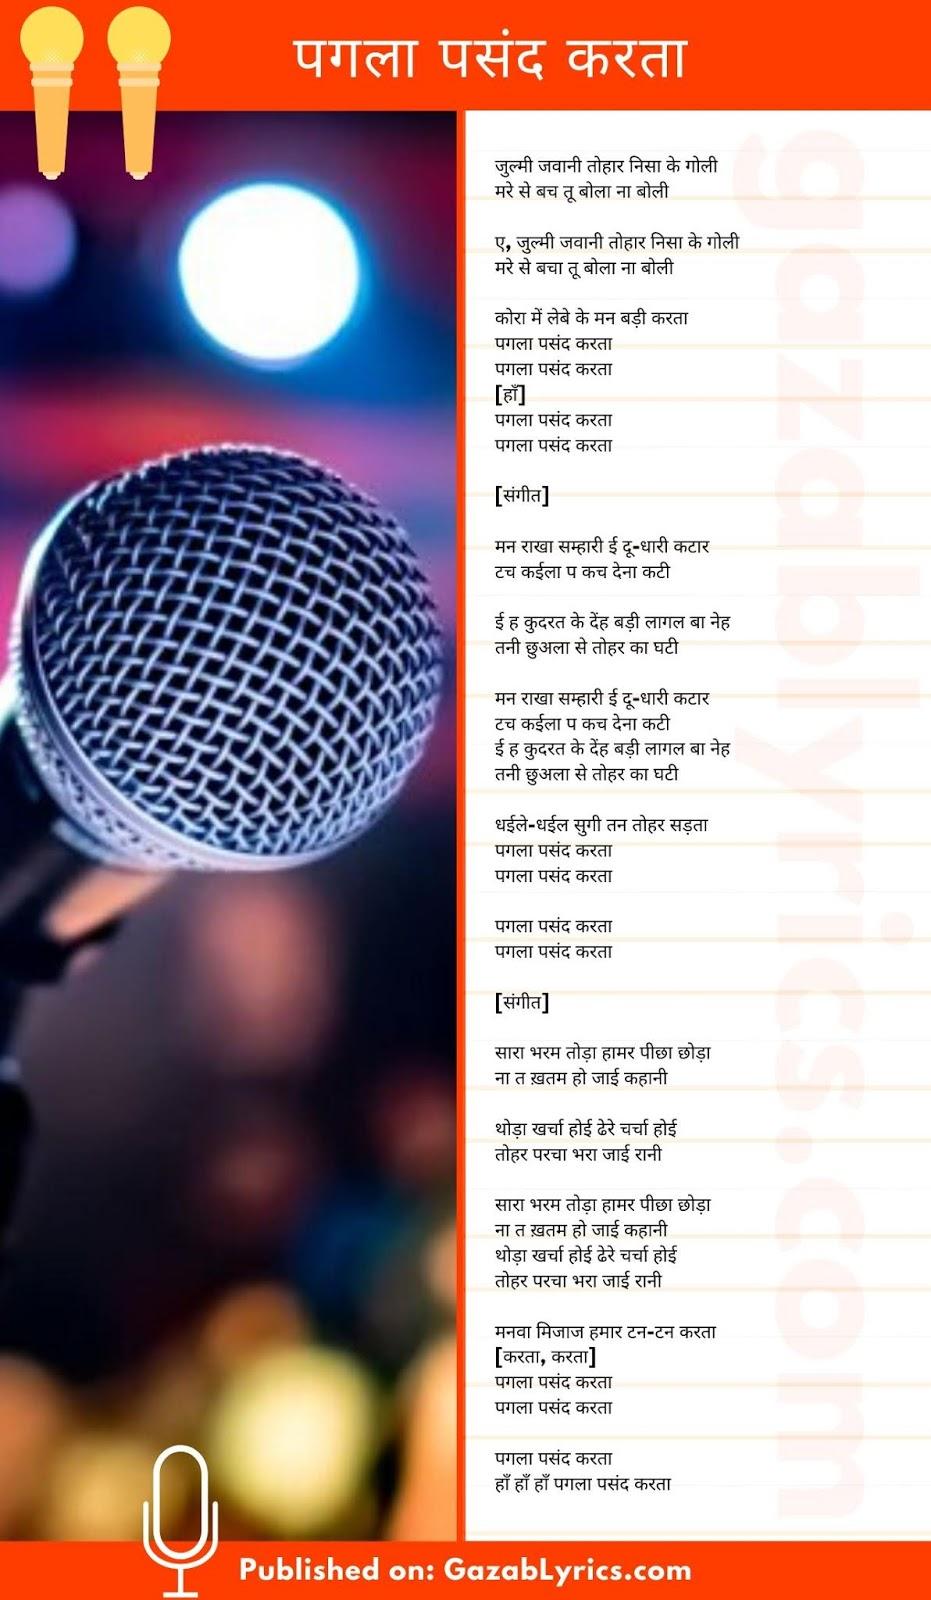 Pagla Pasand Karata song lyrics image